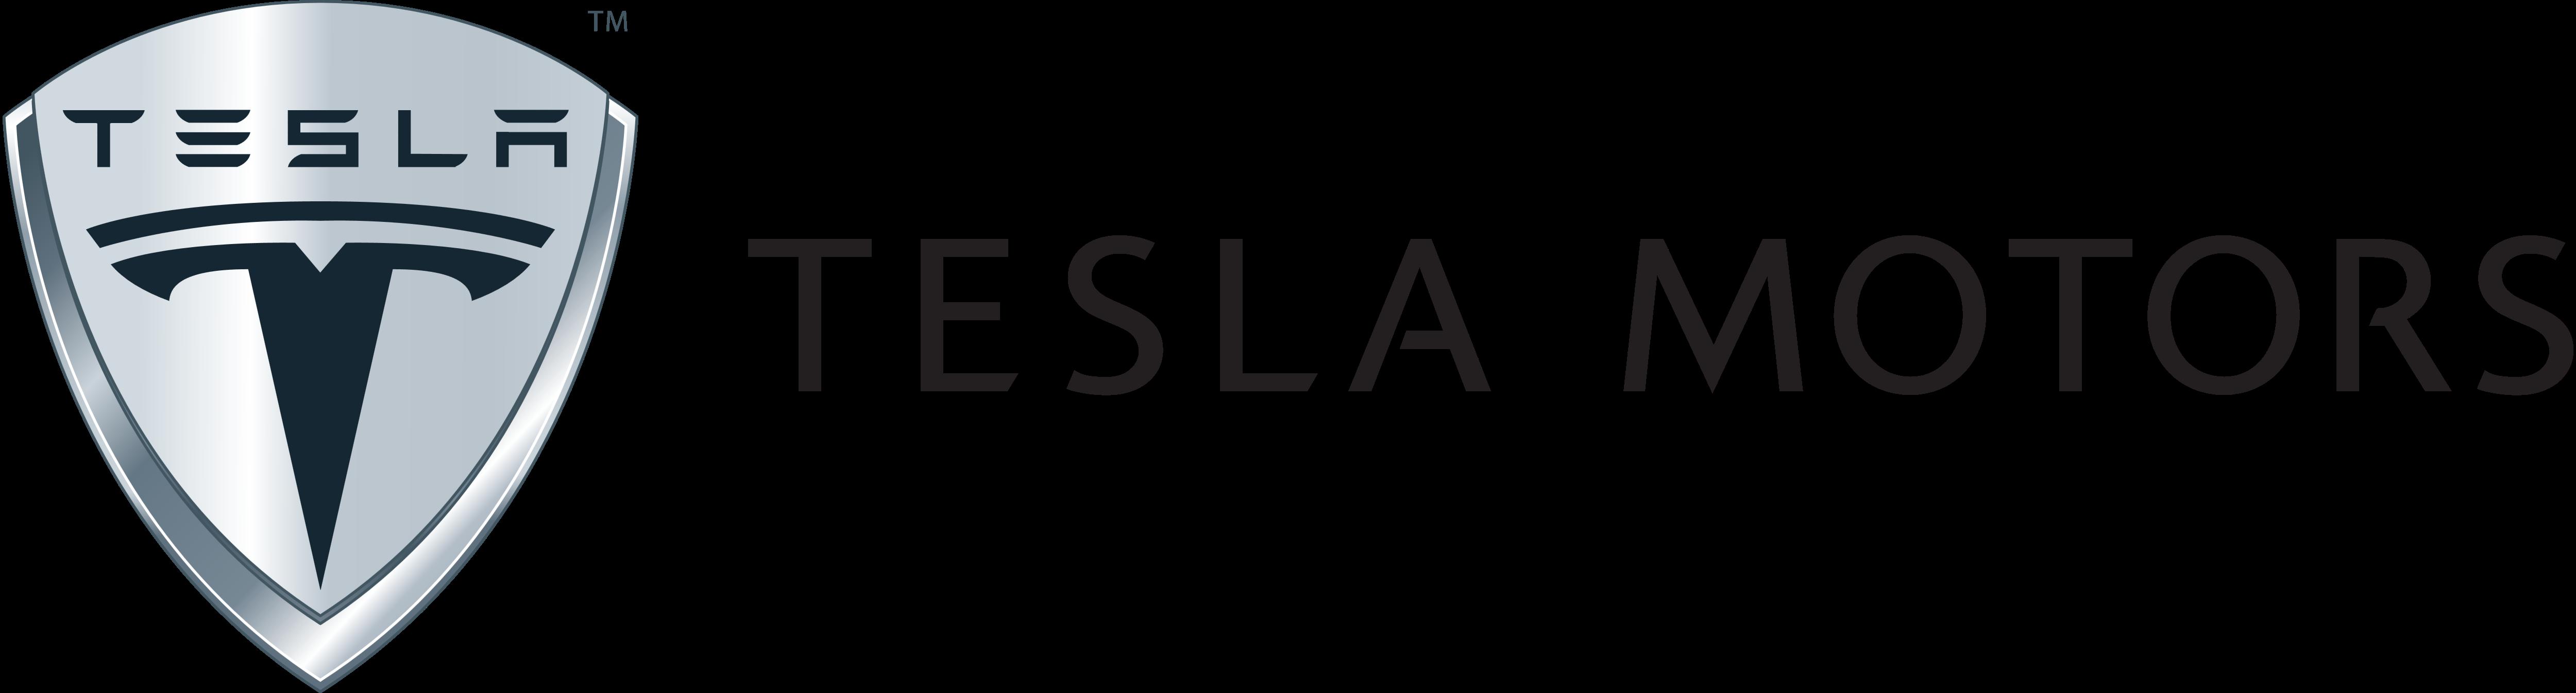 Tesla Motors Logos Download